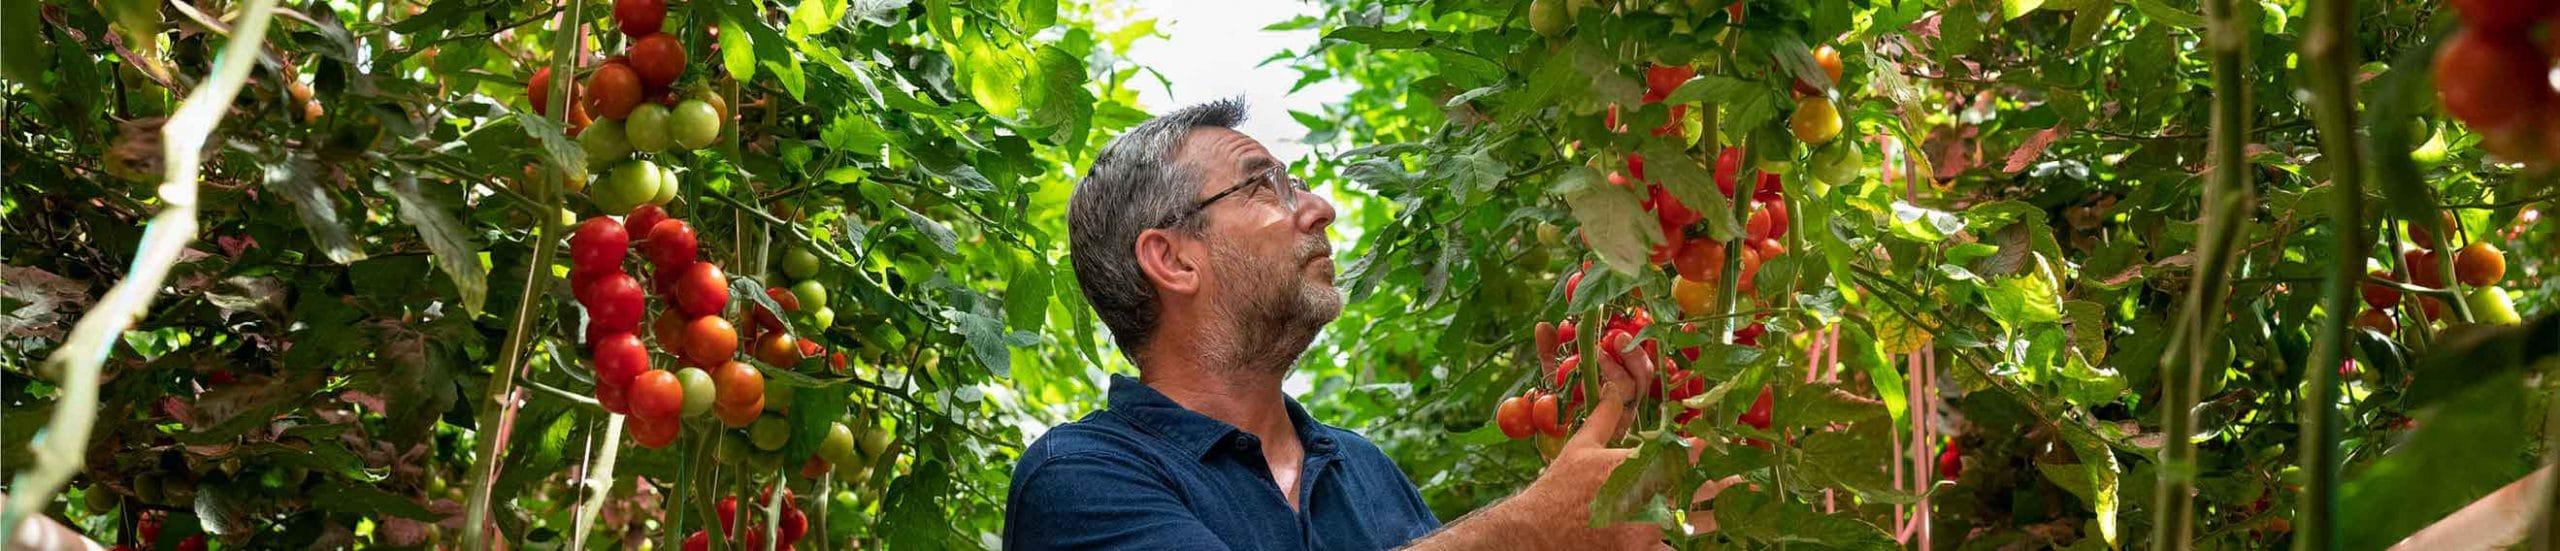 Jean-René observant ses plants de tomates grappe dans sa serre.